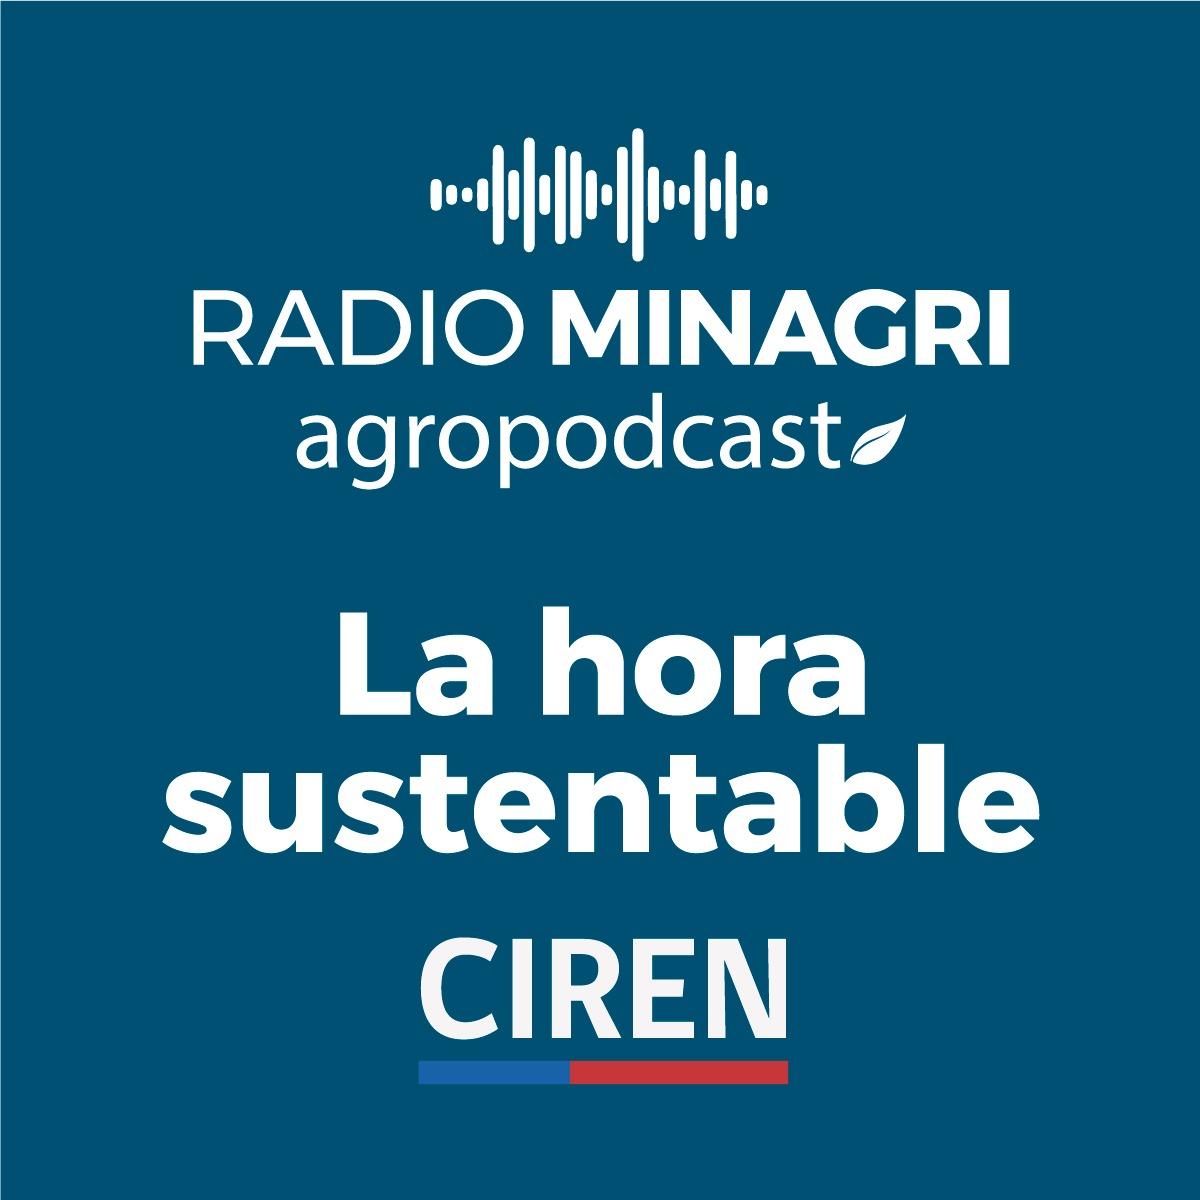 La hora sustentable – Episodio 17: IDE MINAGRI